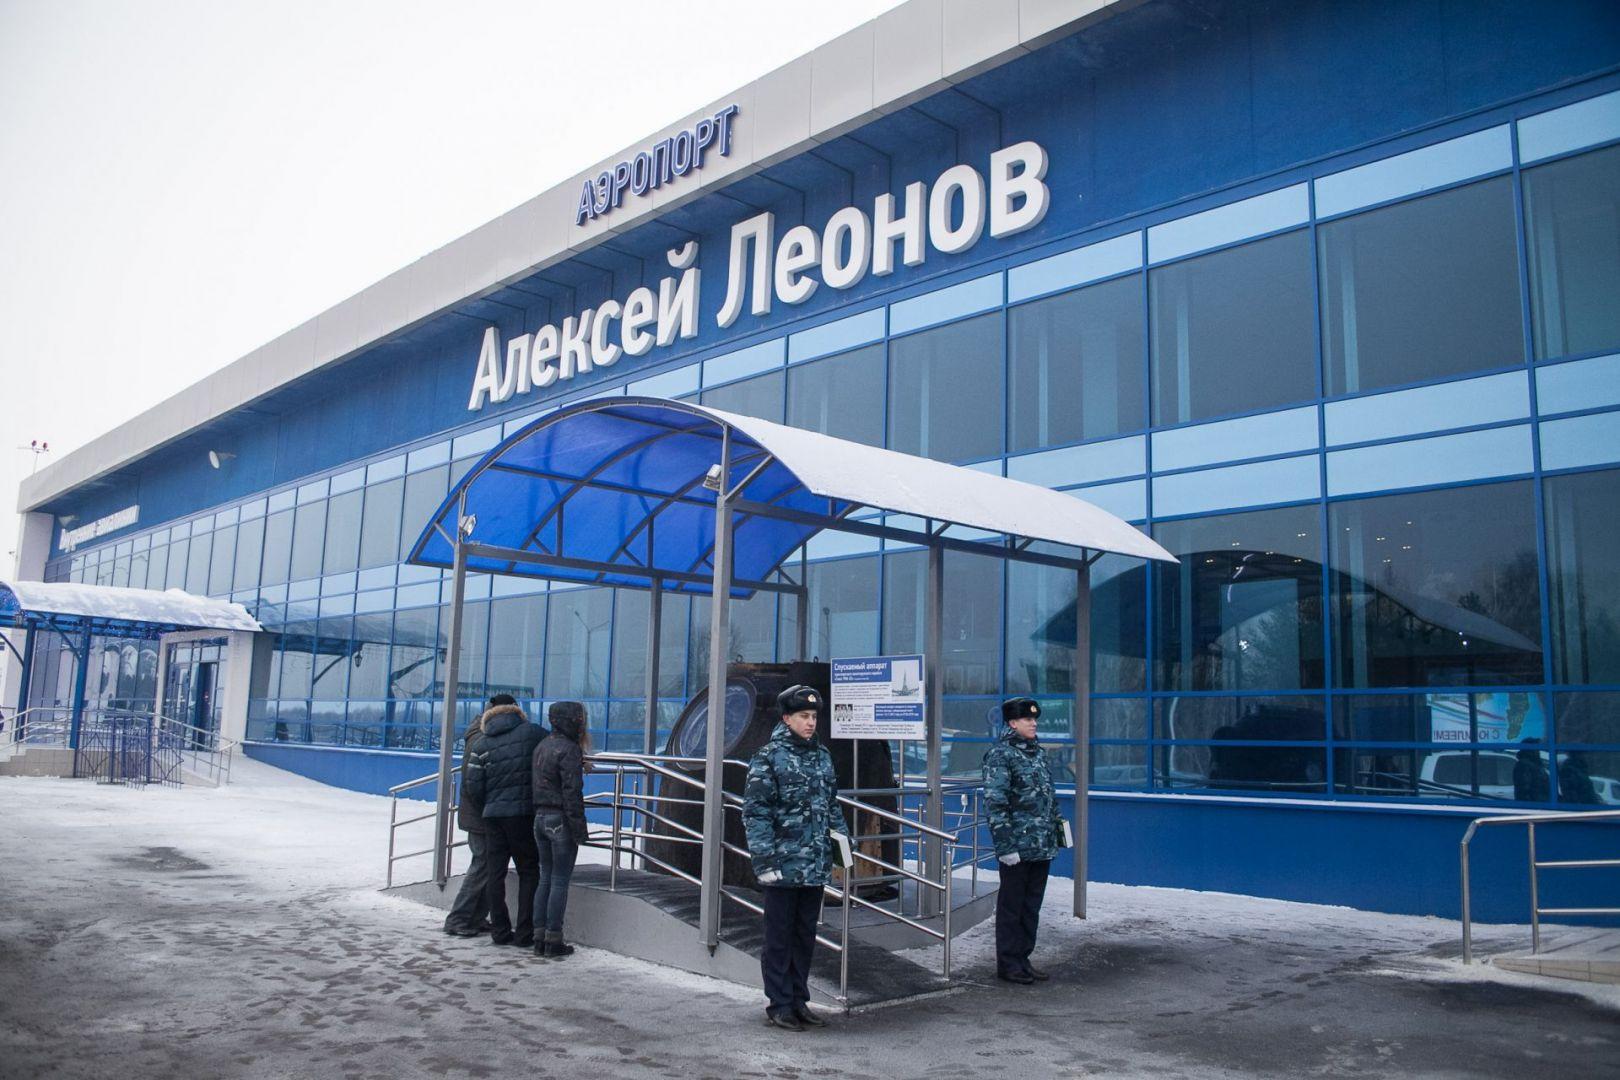 Нетрезвого пассажира непустили всамолёт Кемерово